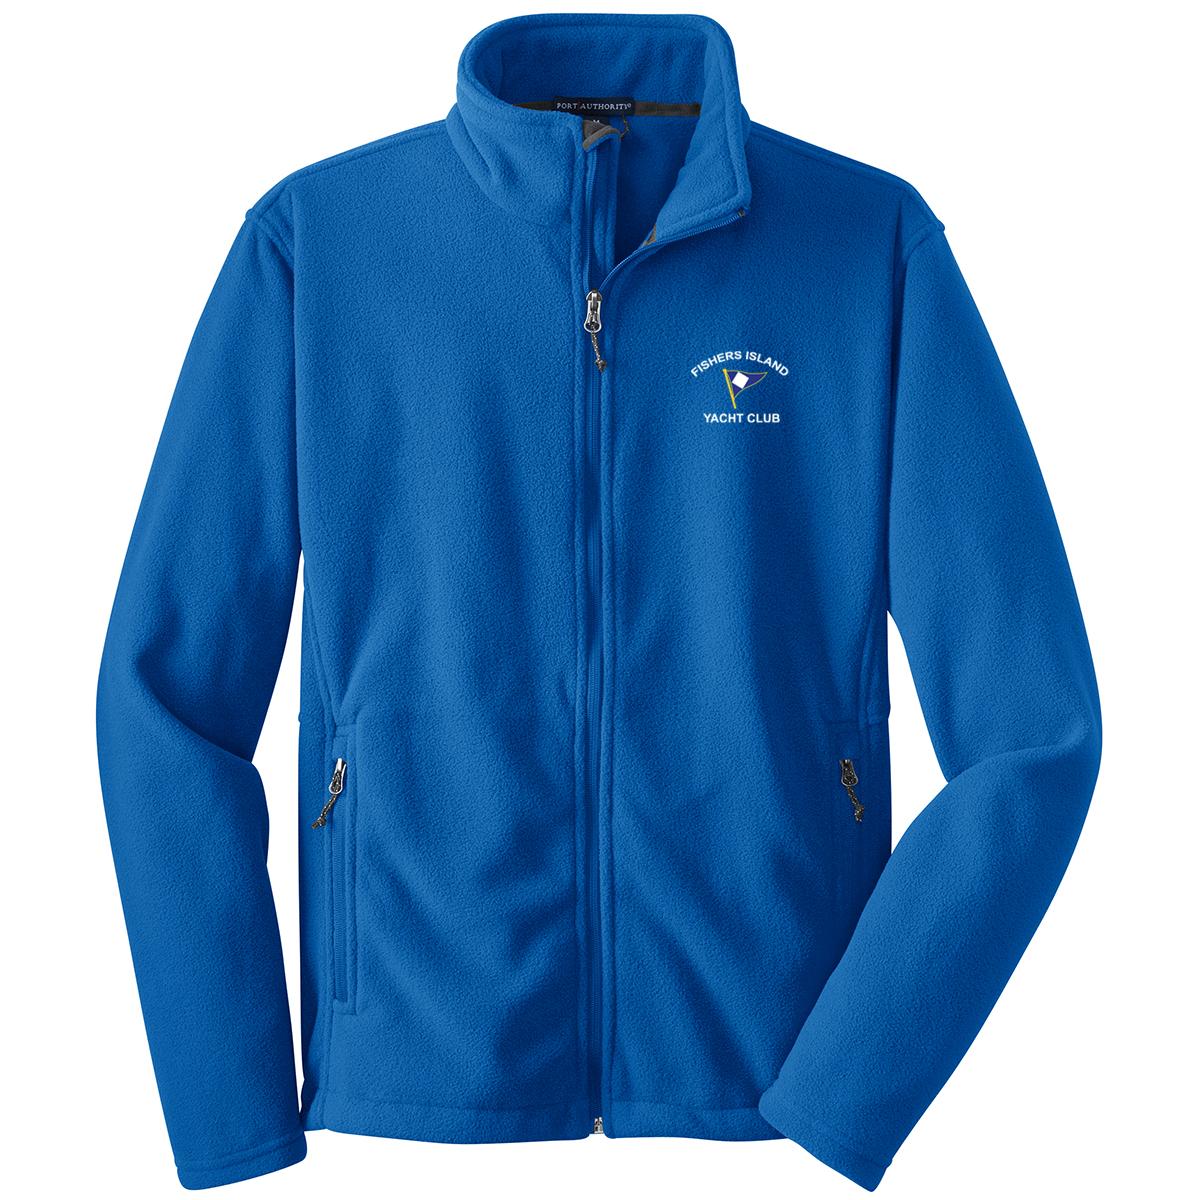 Fishers Island Yacht Club - Men's Full Zip Fleece Jacket